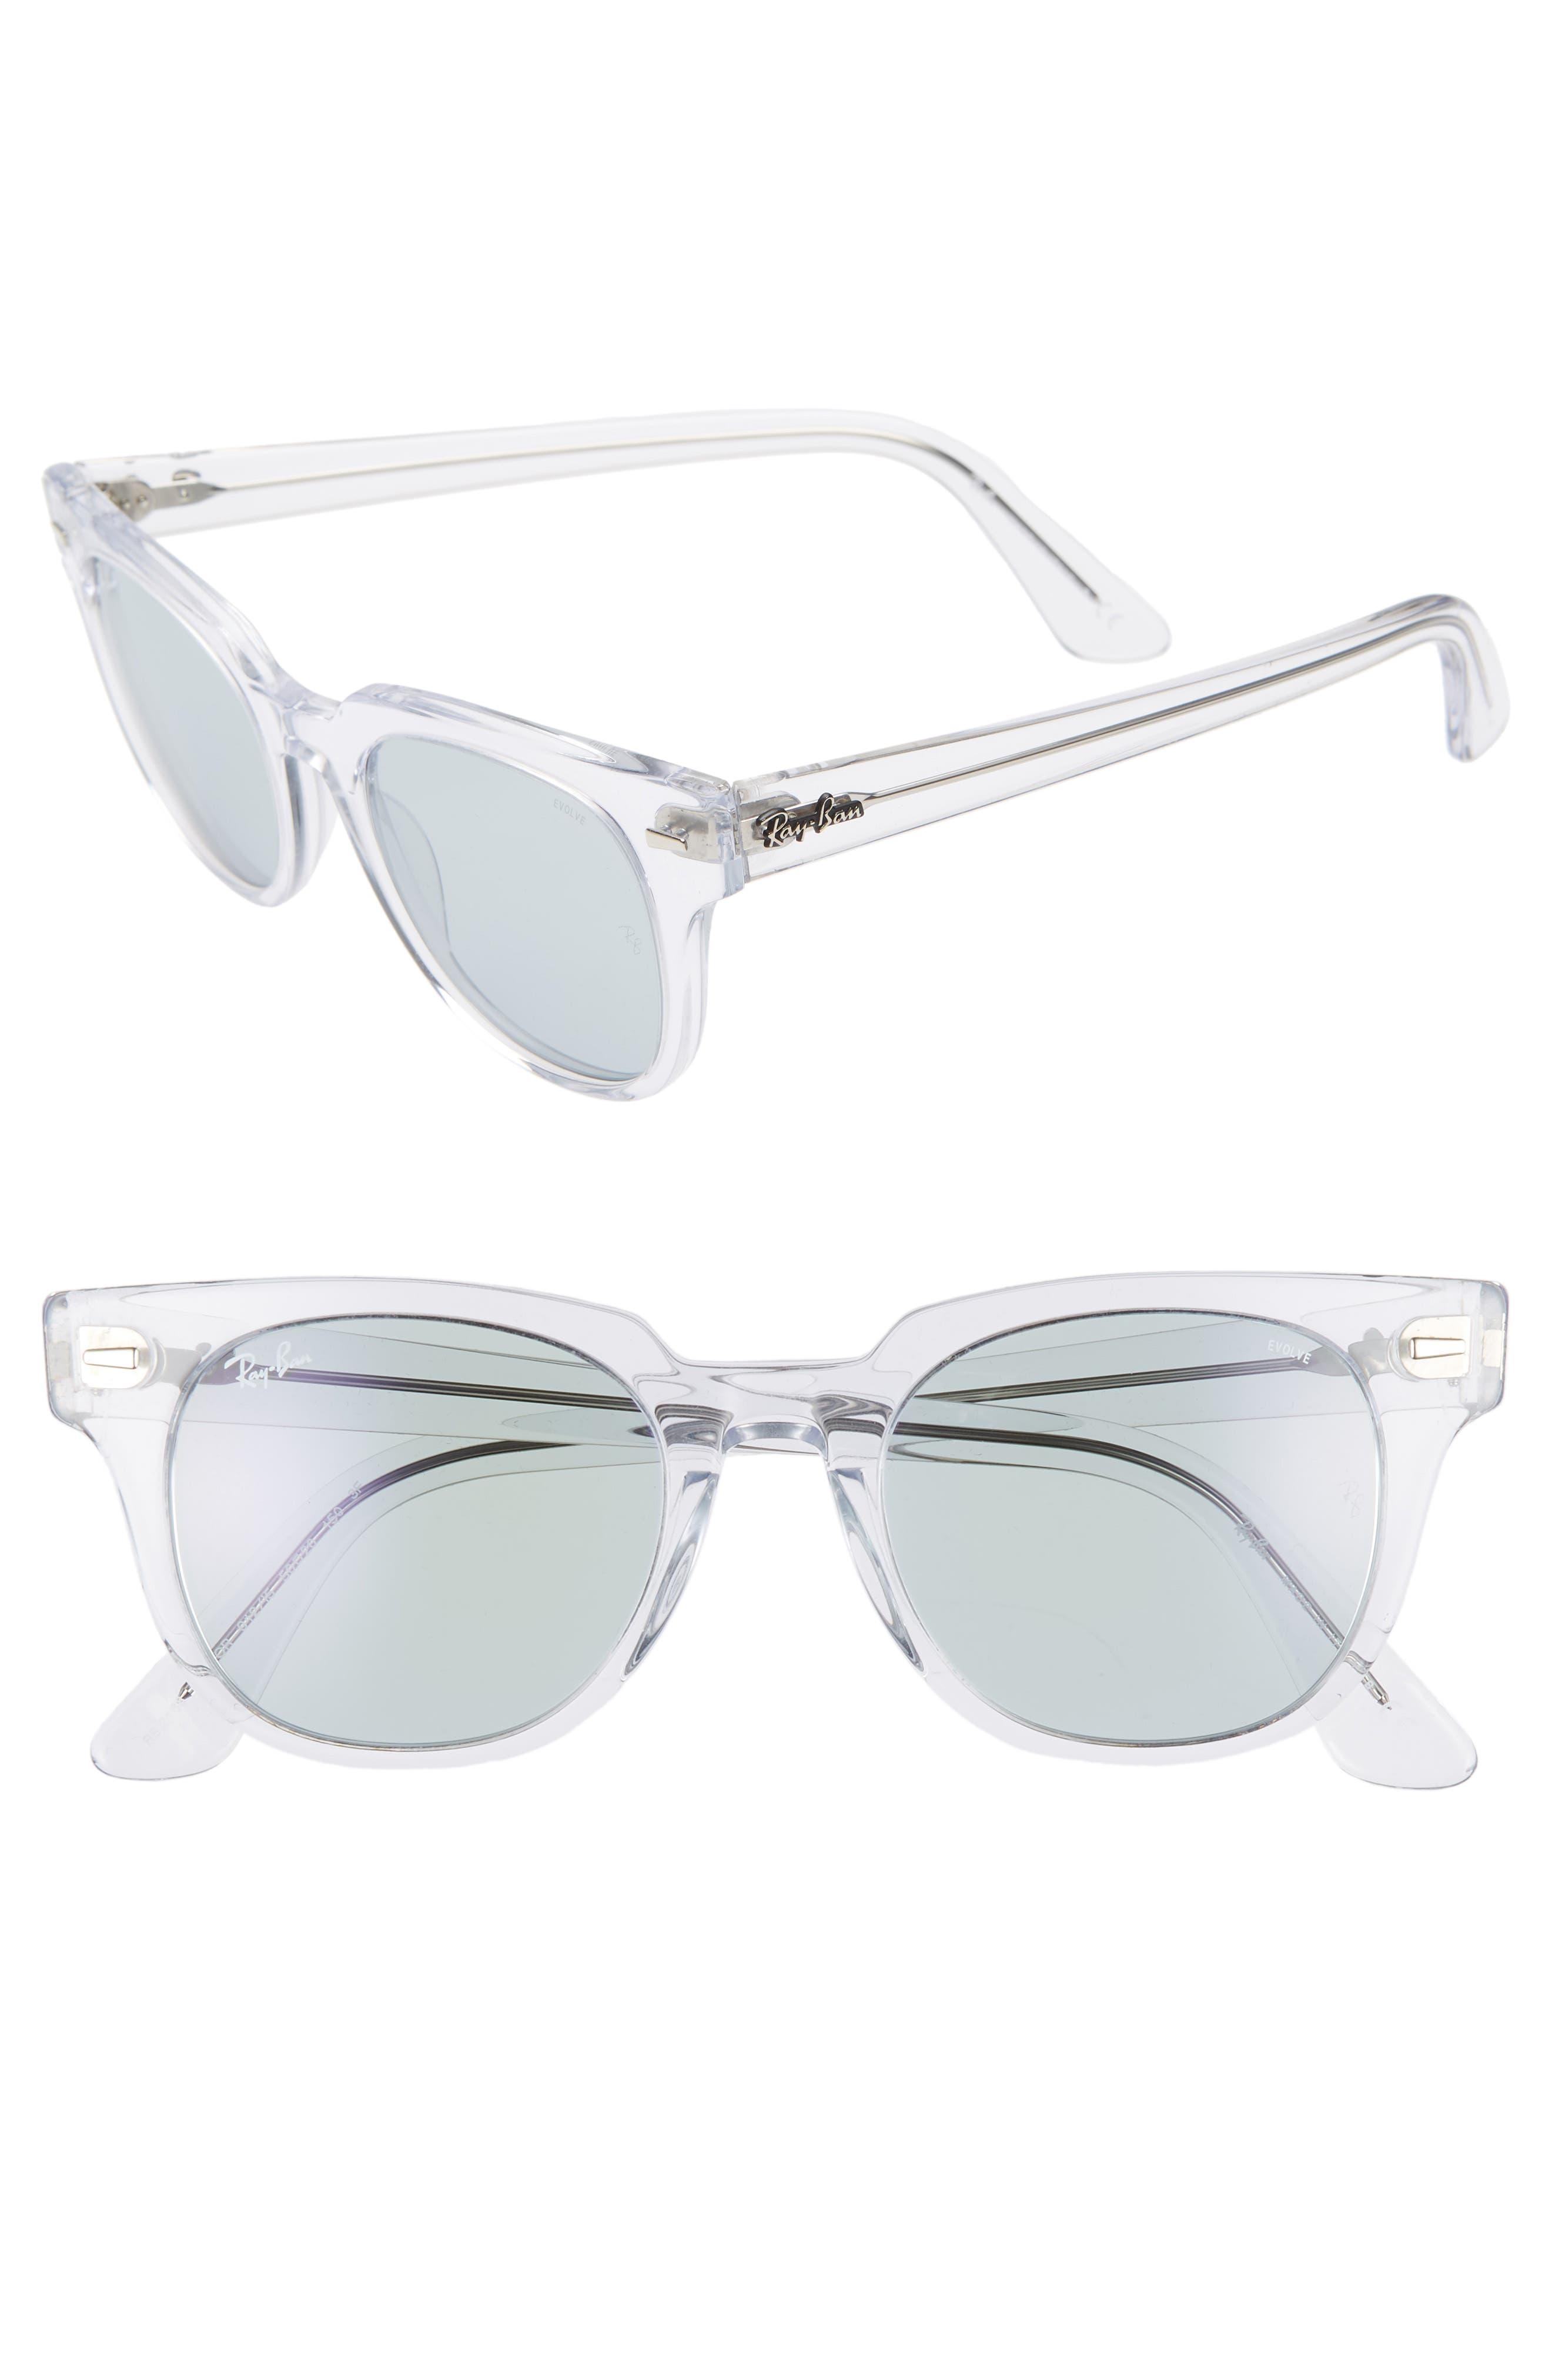 Meteor 50mm Polarized Wayfarer Sunglasses,                             Main thumbnail 1, color,                             CRYSTAL/ BLUE SOLID